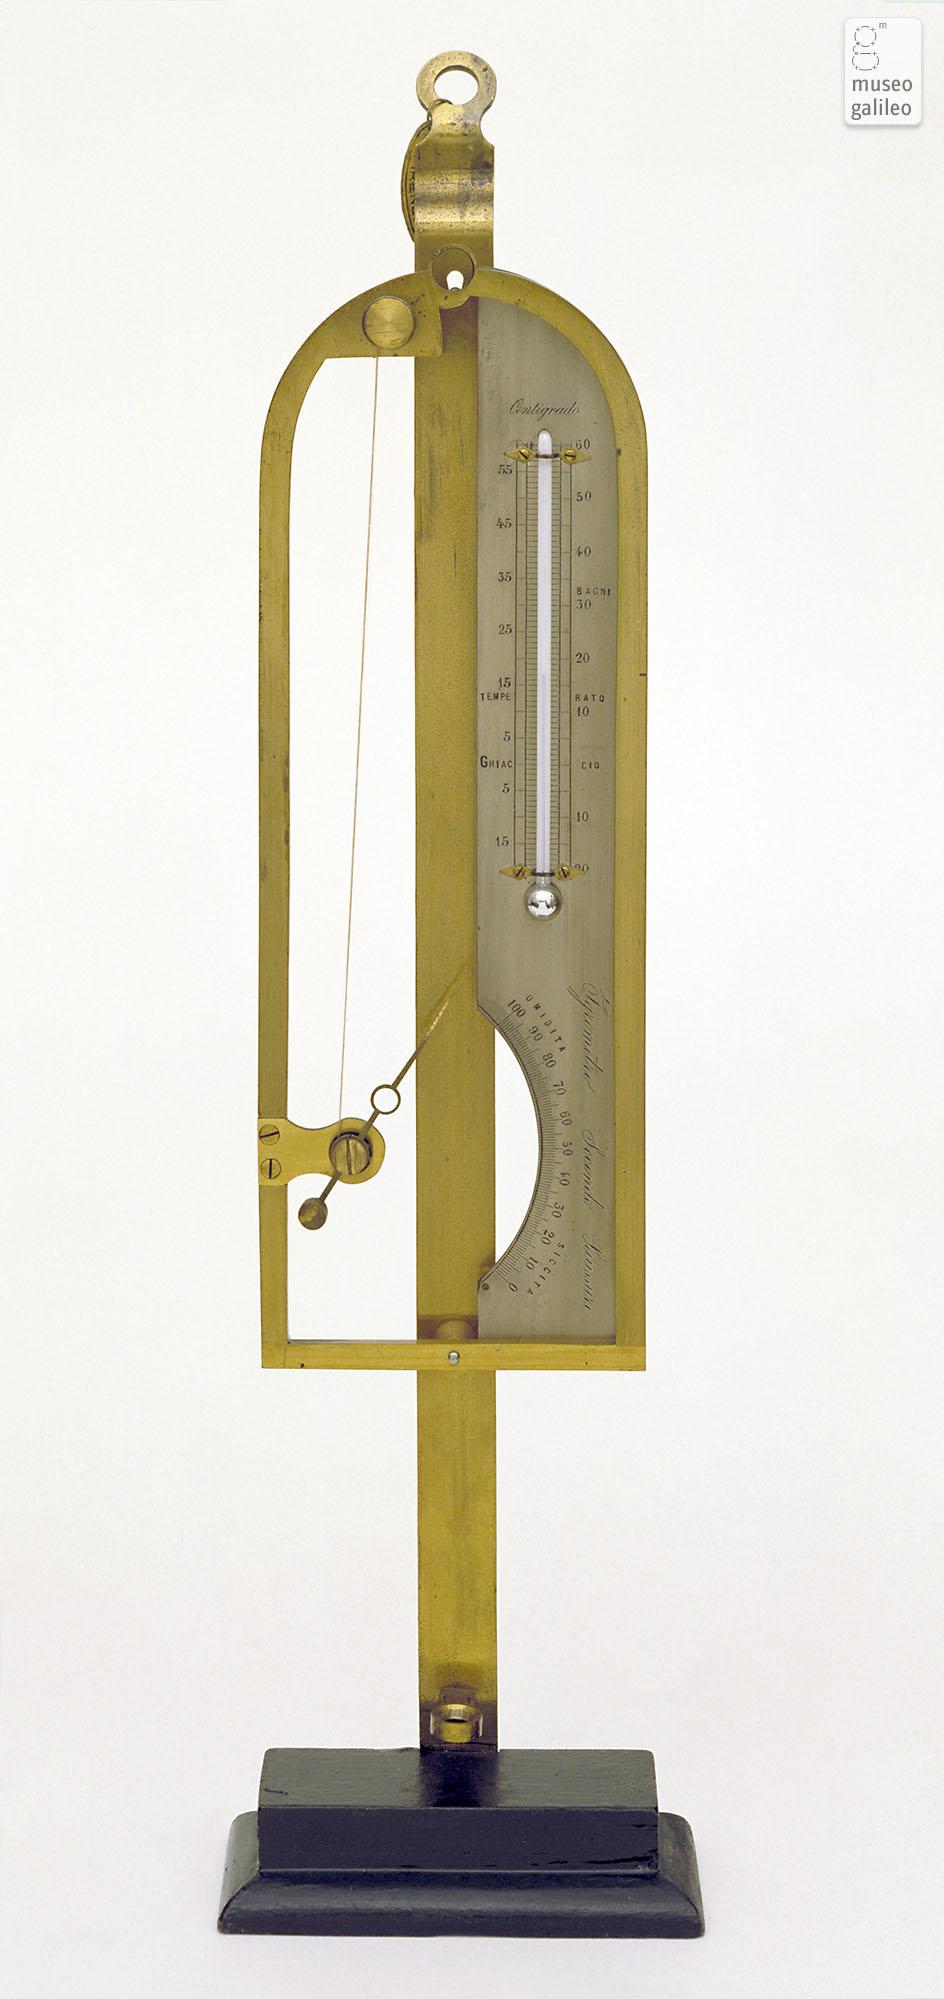 Museo Galileo - Enlarged image - Hair hygrometer (Inv. 3708)